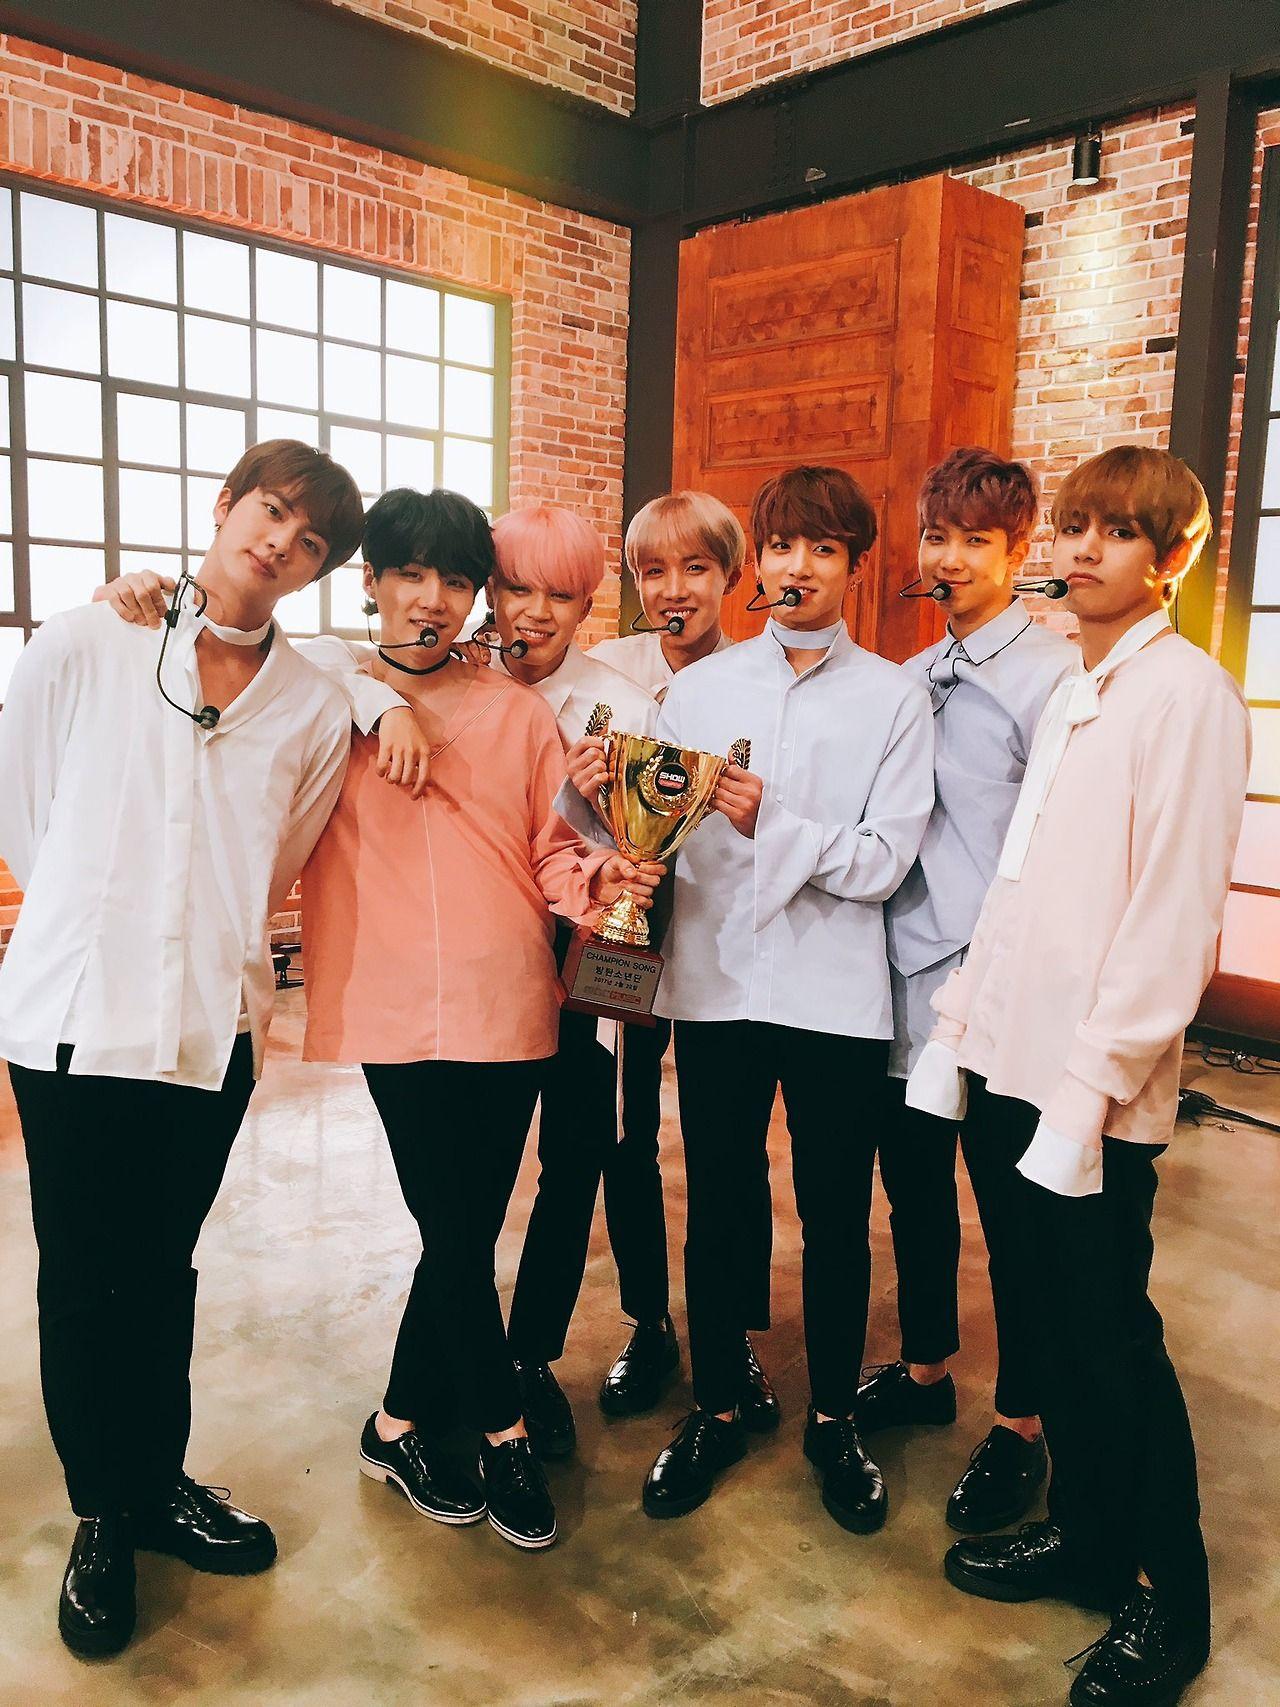 170226 SHOW CHAMPION's Tweet    방탄소년단의 따끈한 챔피언송 인증샷~ 조준~ 발사~ 방탄과 함께라면 언제나 봄날입니다… 다시 한번 방탄소년단의 챔피언송 수상을 축하드립니다^^ 짝짝짝  A proof shot of BTS' hot 'Champion Song' (award)~ Aim~ Fire~ As long as you're with BTS, it's always a spring day… Congratulations once again to BTS on winning 'Champion Song'^^ Clap clap clap  Trans cr: Kylie @ allforbts  © Please credit when taking out